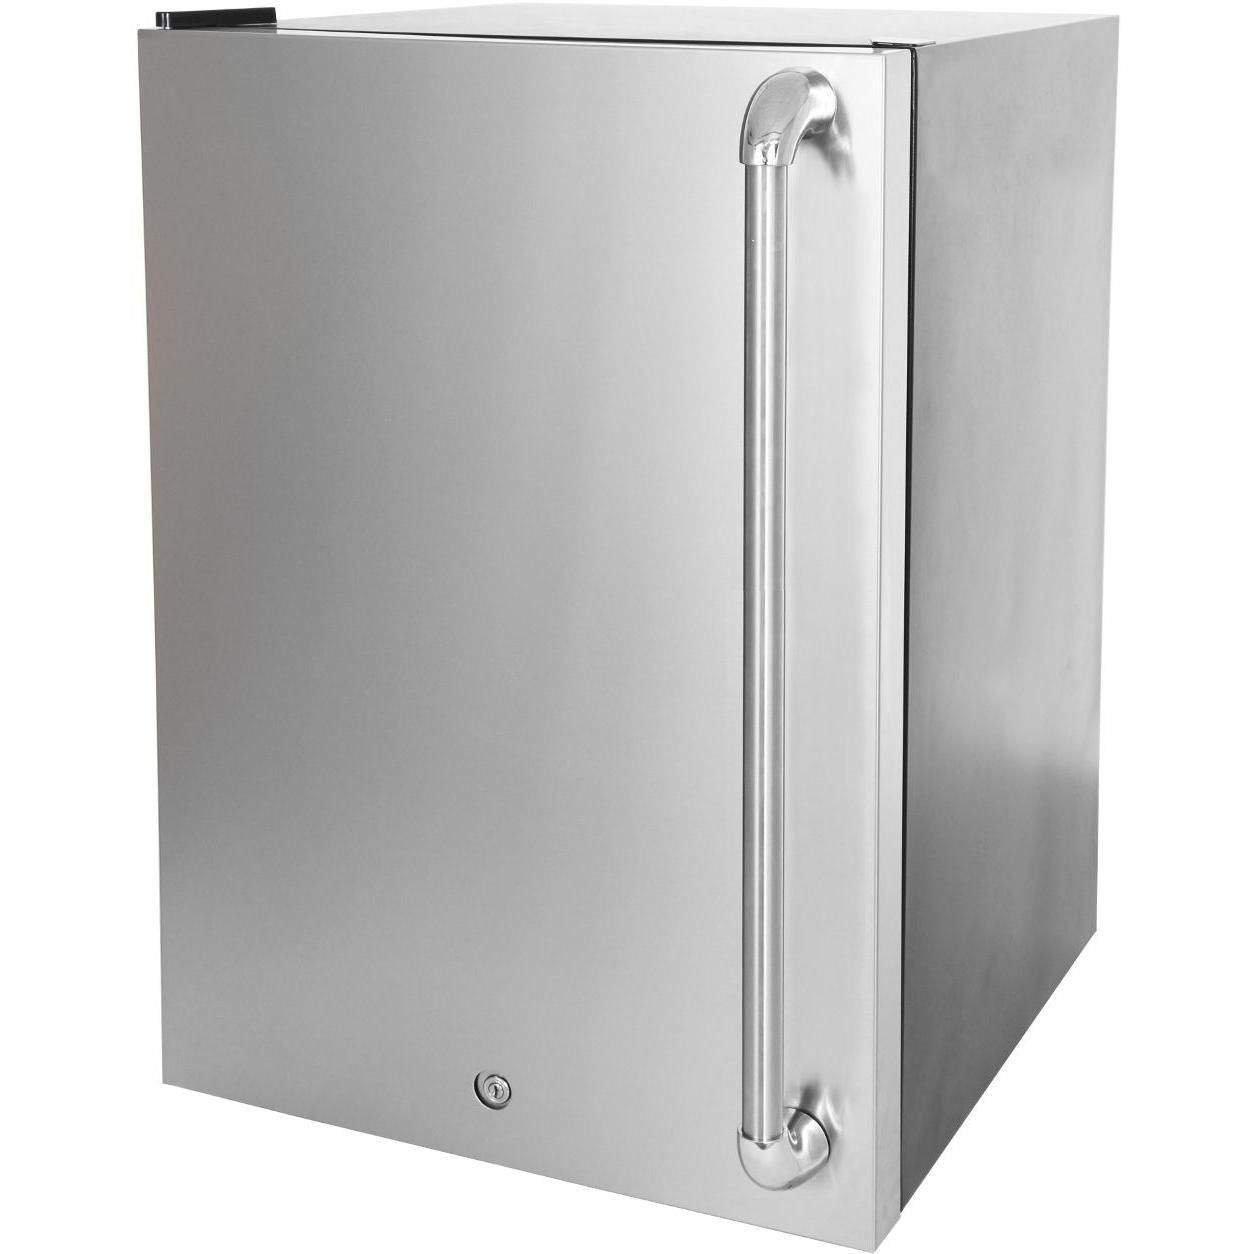 Blaze Stainless Front Door Upgrade 4.5 for Left Hinge (BLZ-SSRF130-BLZ-SSFP-4-5LH) by Blaze (Image #1)